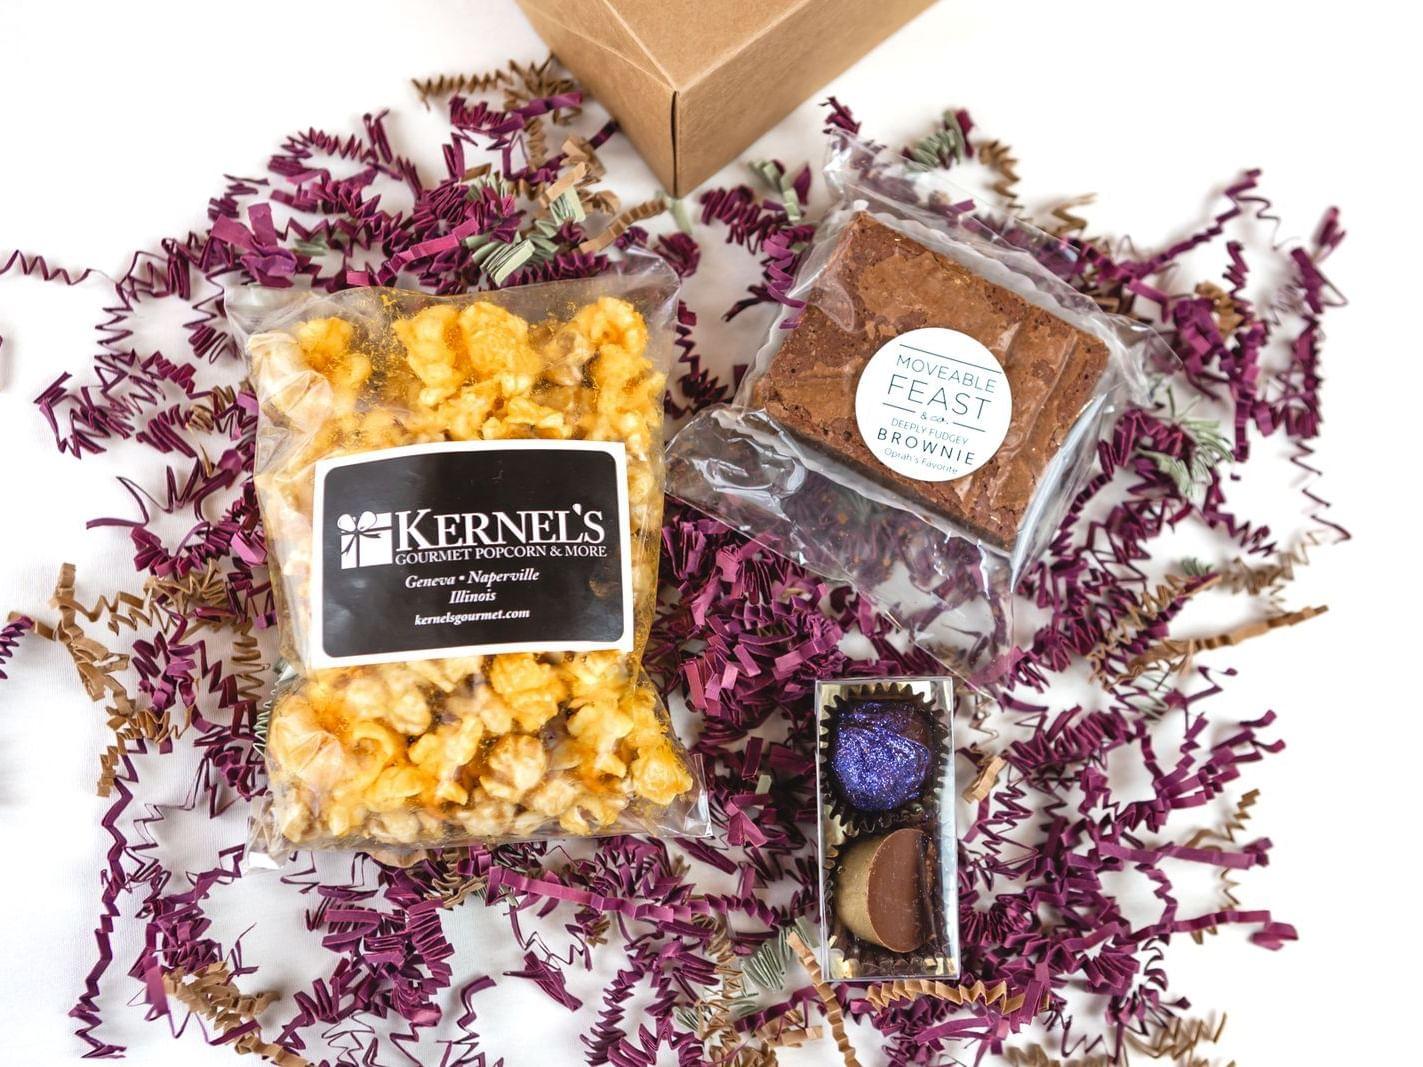 kernel corn, brownie, and chocolate treats